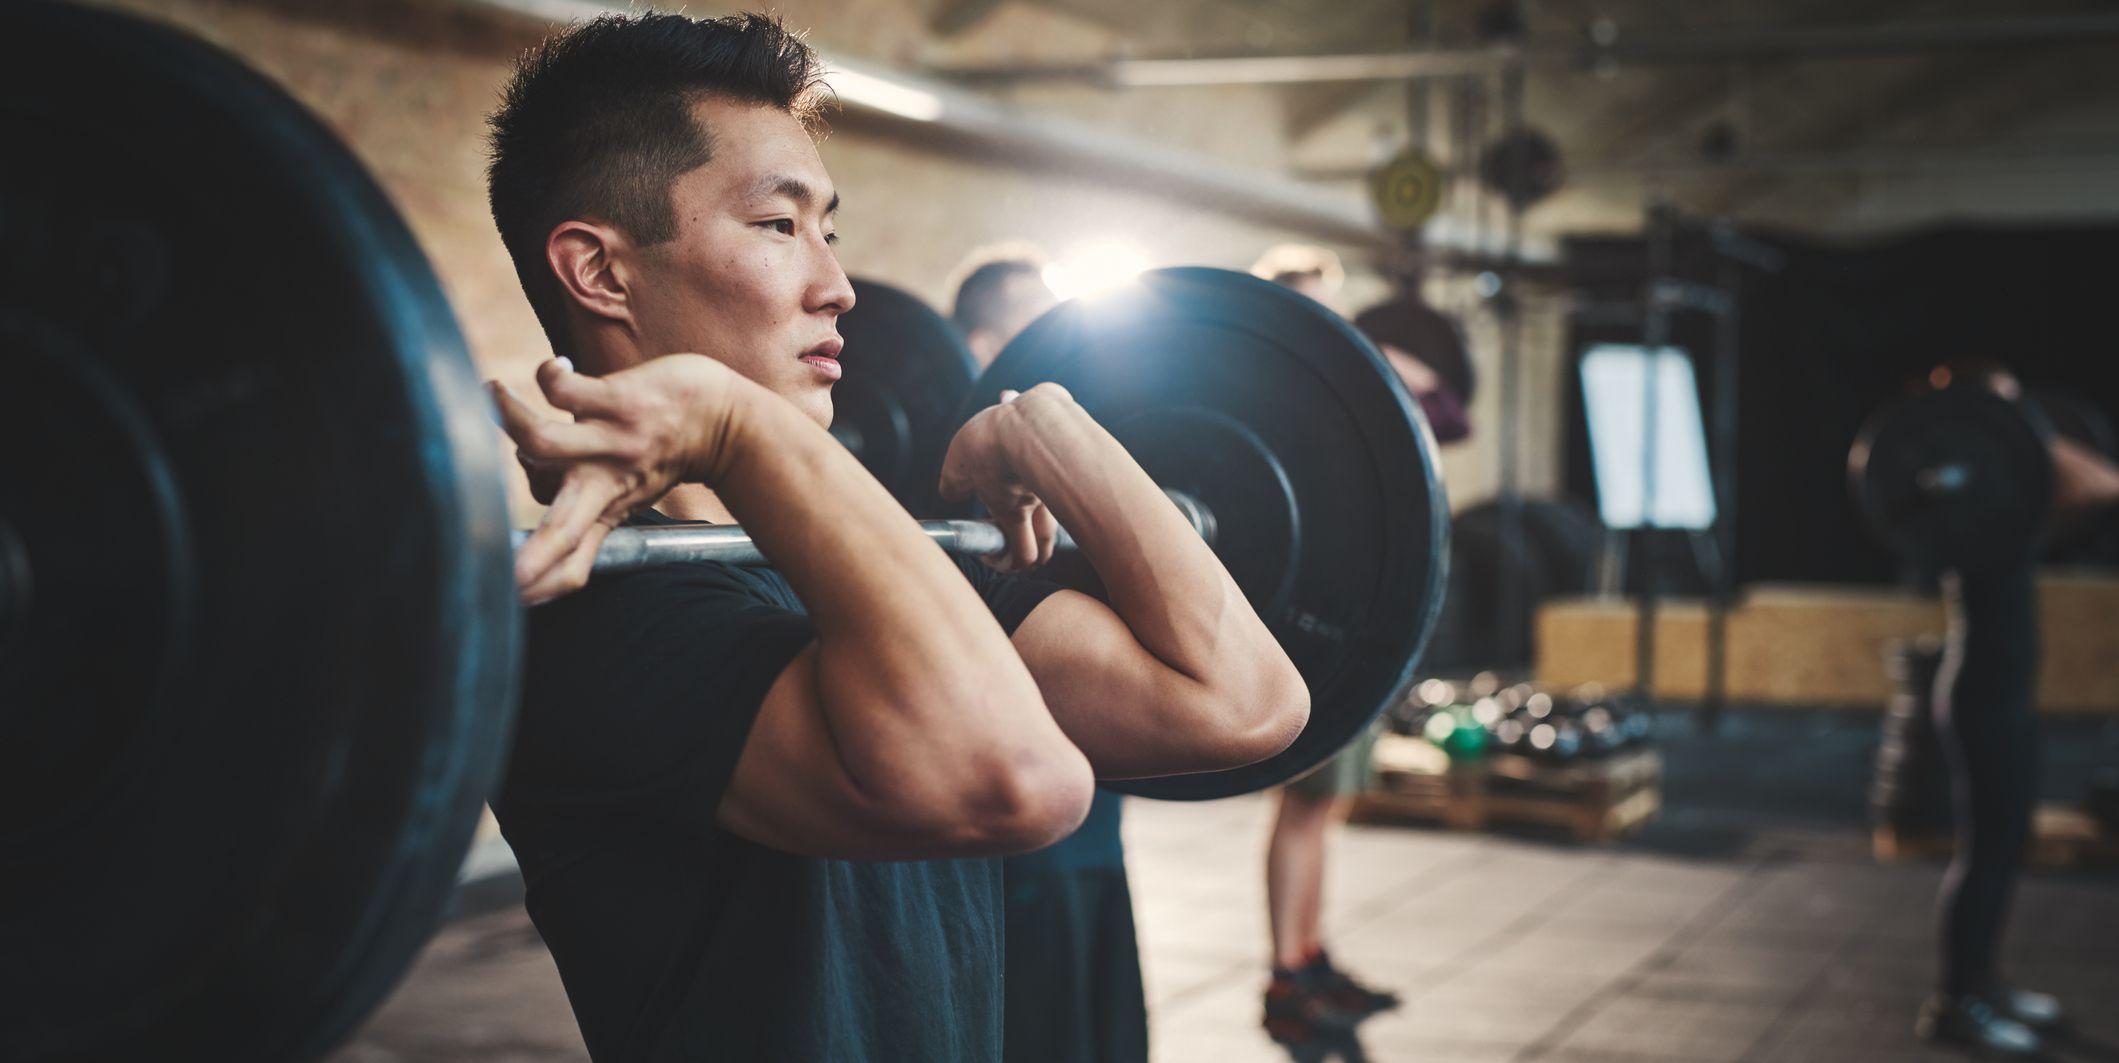 Building a Little Muscle Could Drop Your Diabetes Risk By a Lot